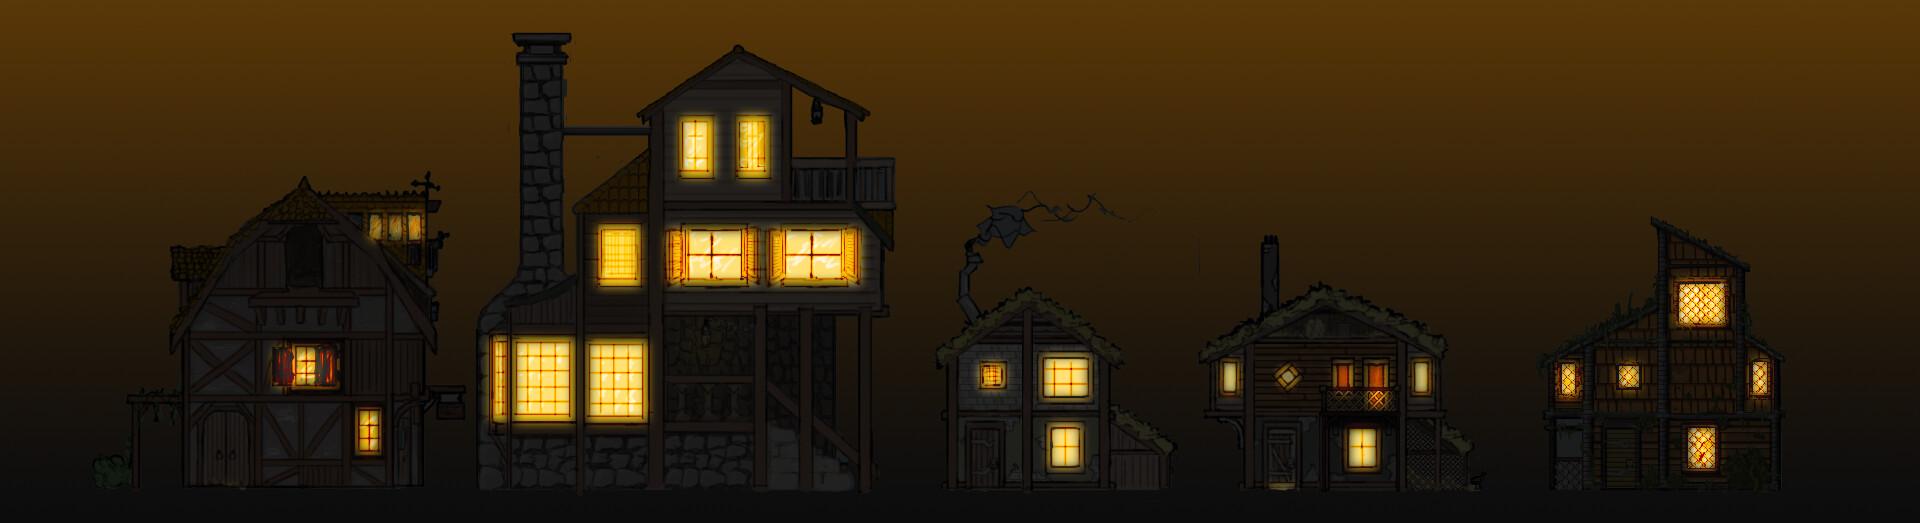 Alexander laheij house designs dark v2